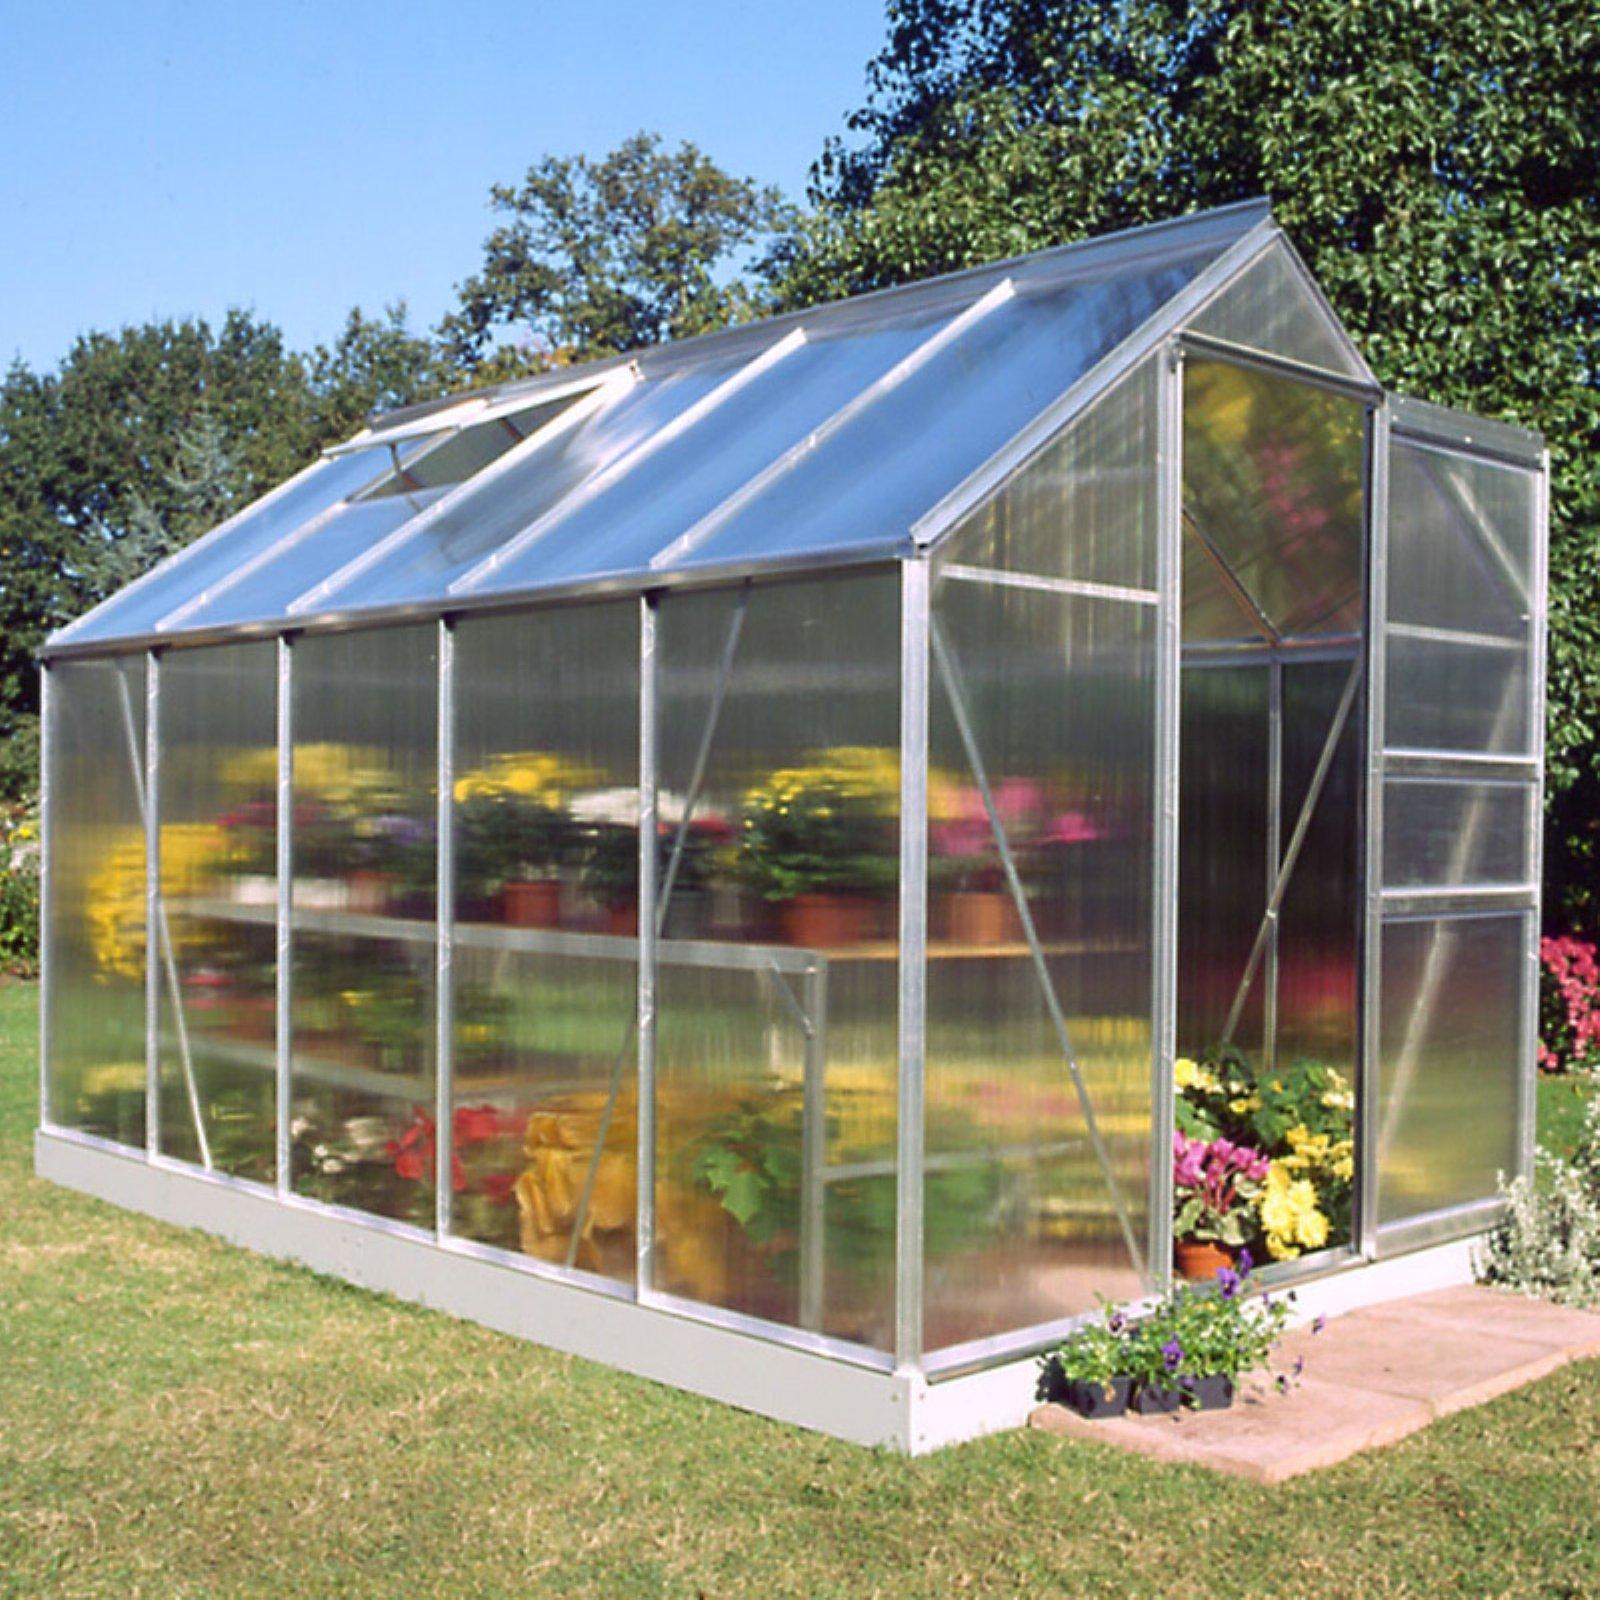 Halls Popular 6 x 10-Foot Greenhouse